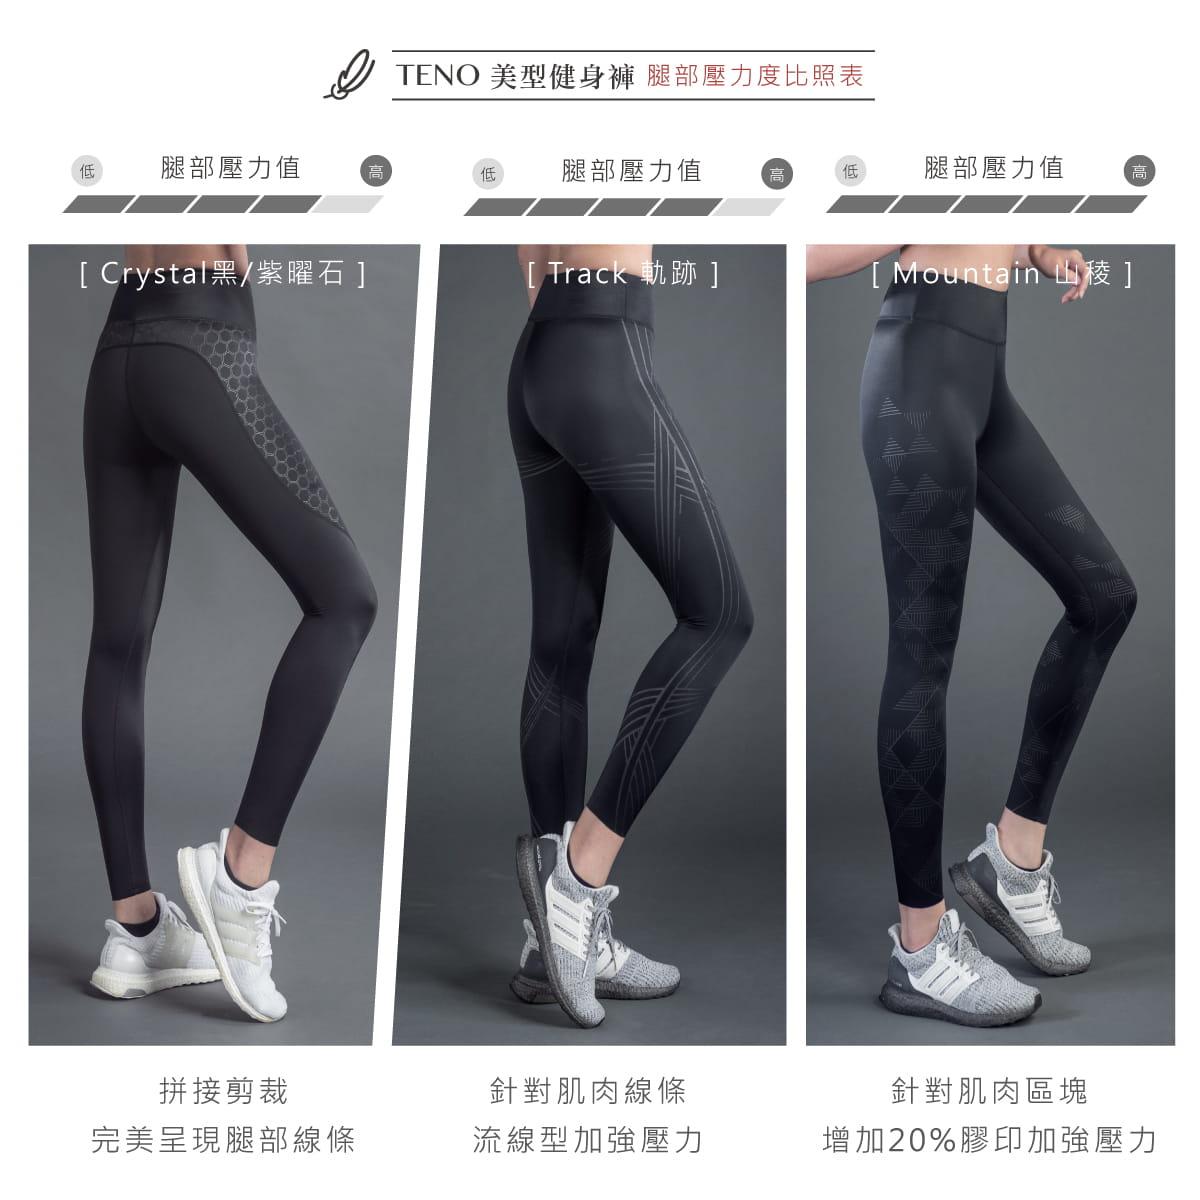 TENO超彈感美型健身褲-Mountain山稜 7